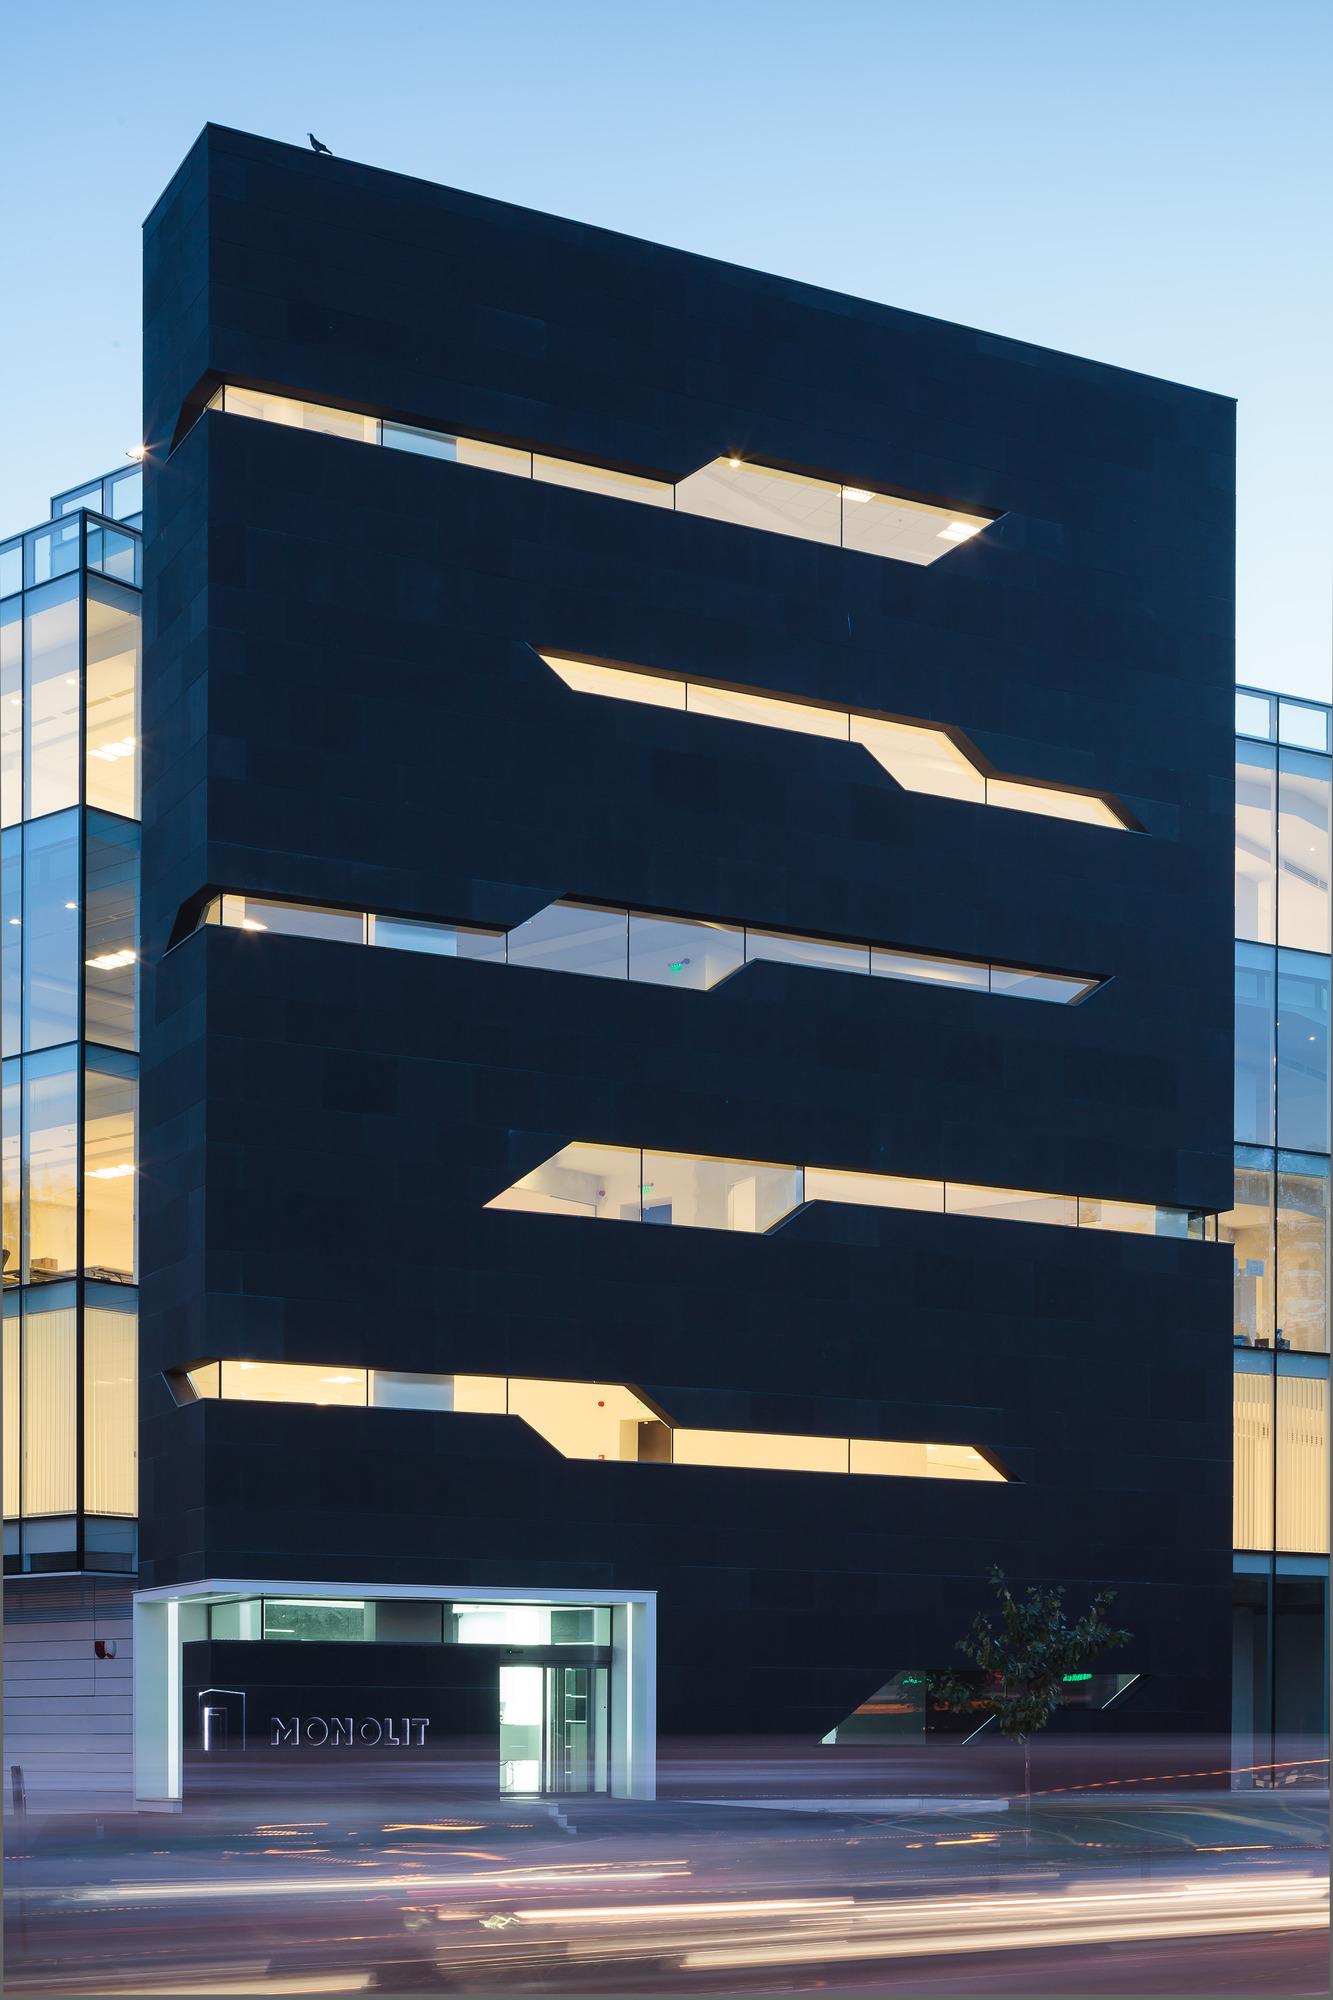 5111d499b3fc4bae40000020_monolit-office-building-igloo-architecture_cdragomir_monolit_012